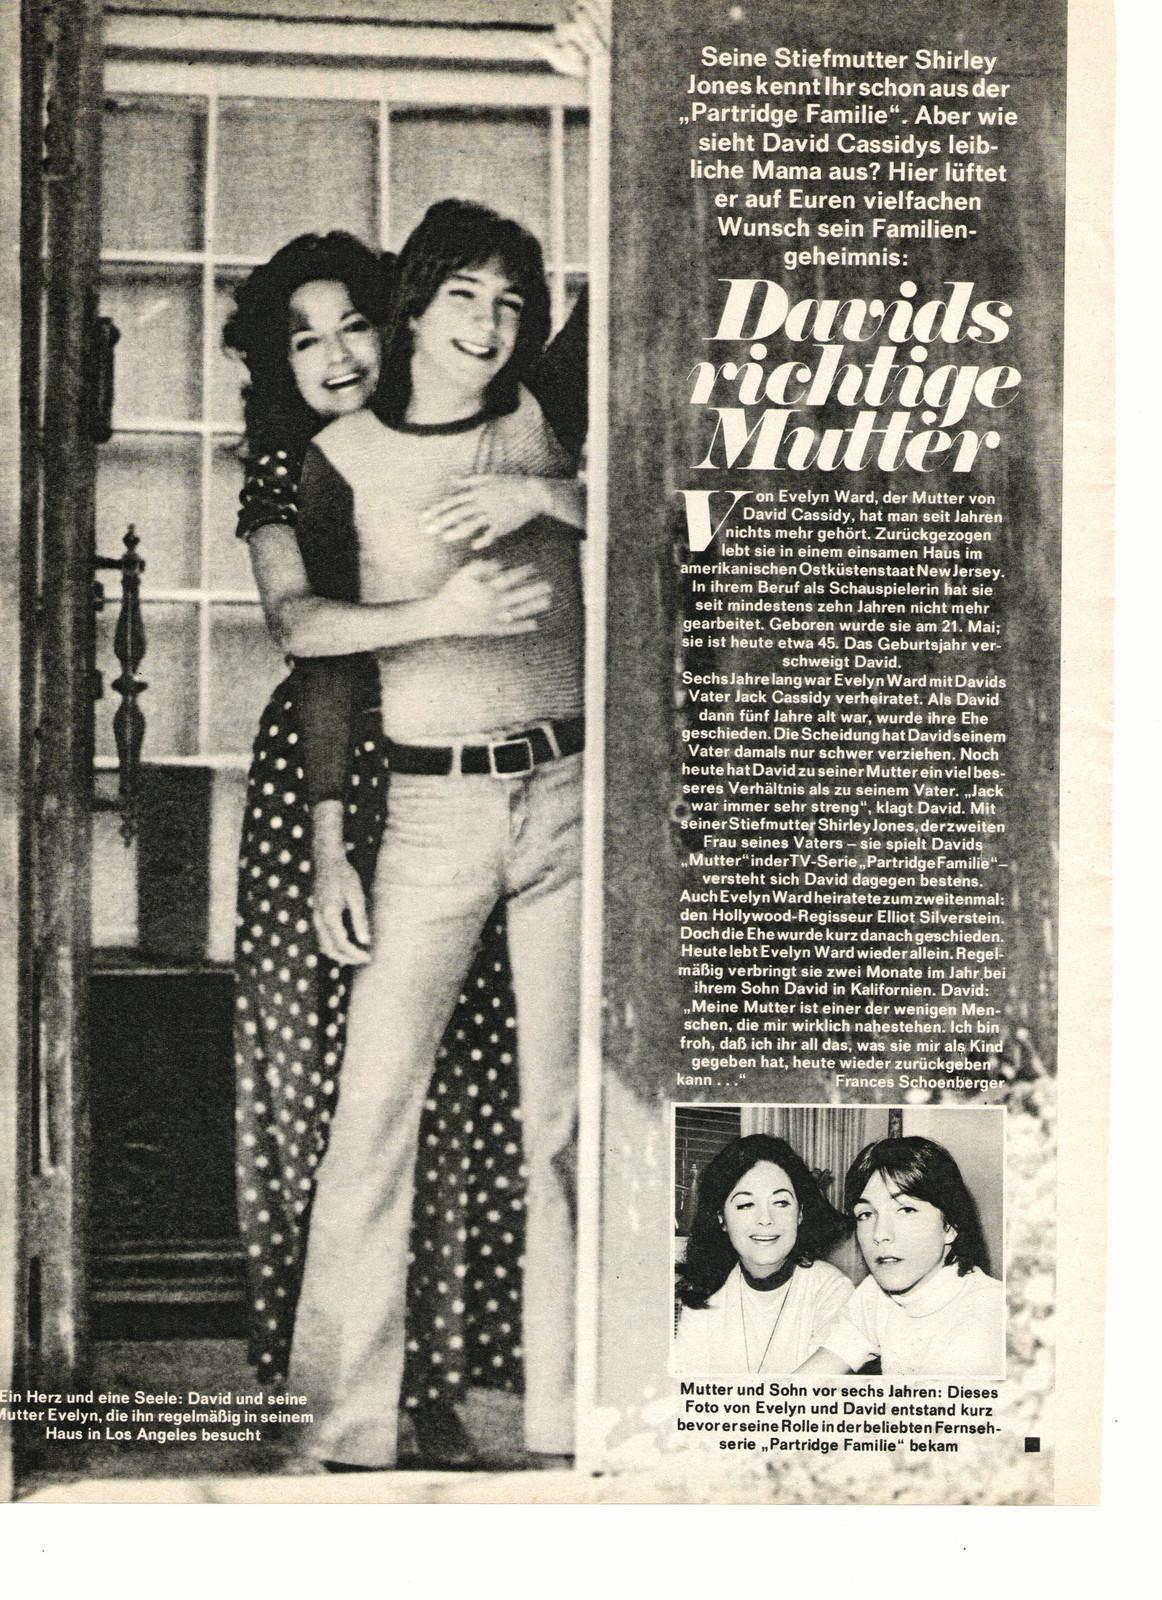 david cassidy teen magazine pinup